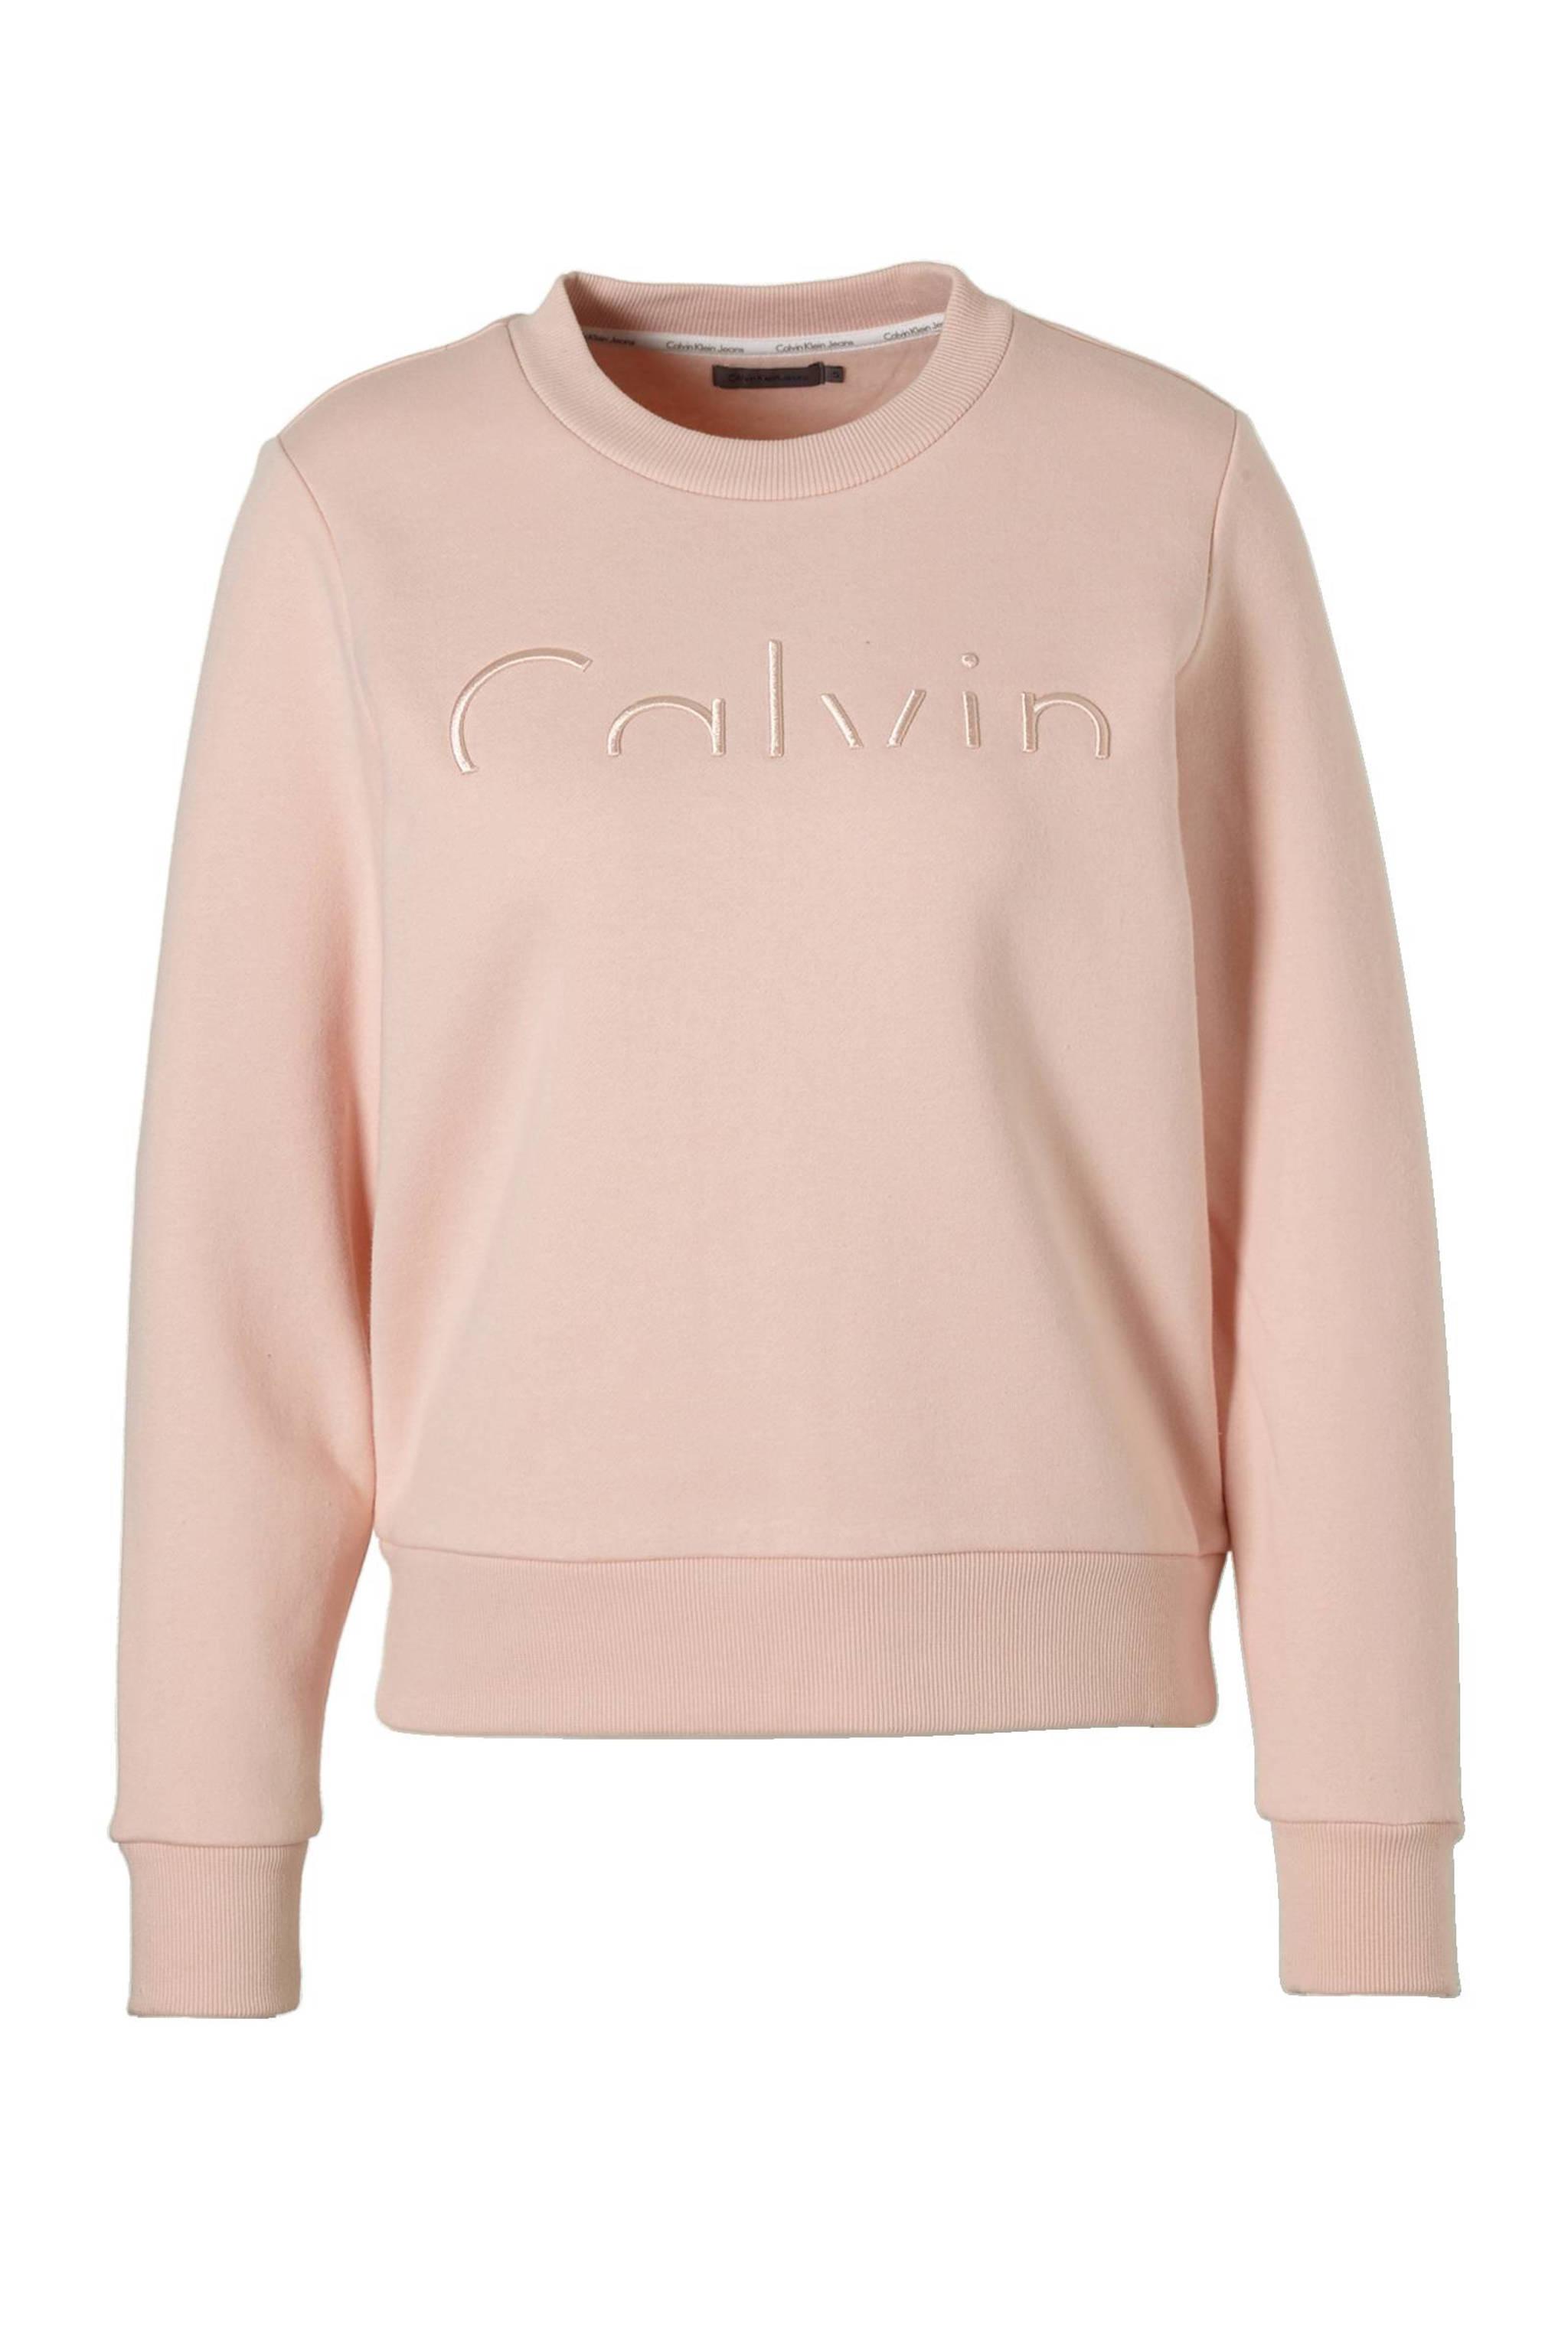 Licht Roze Trui.Calvin Klein Jeans Hadar Sweater Wehkamp